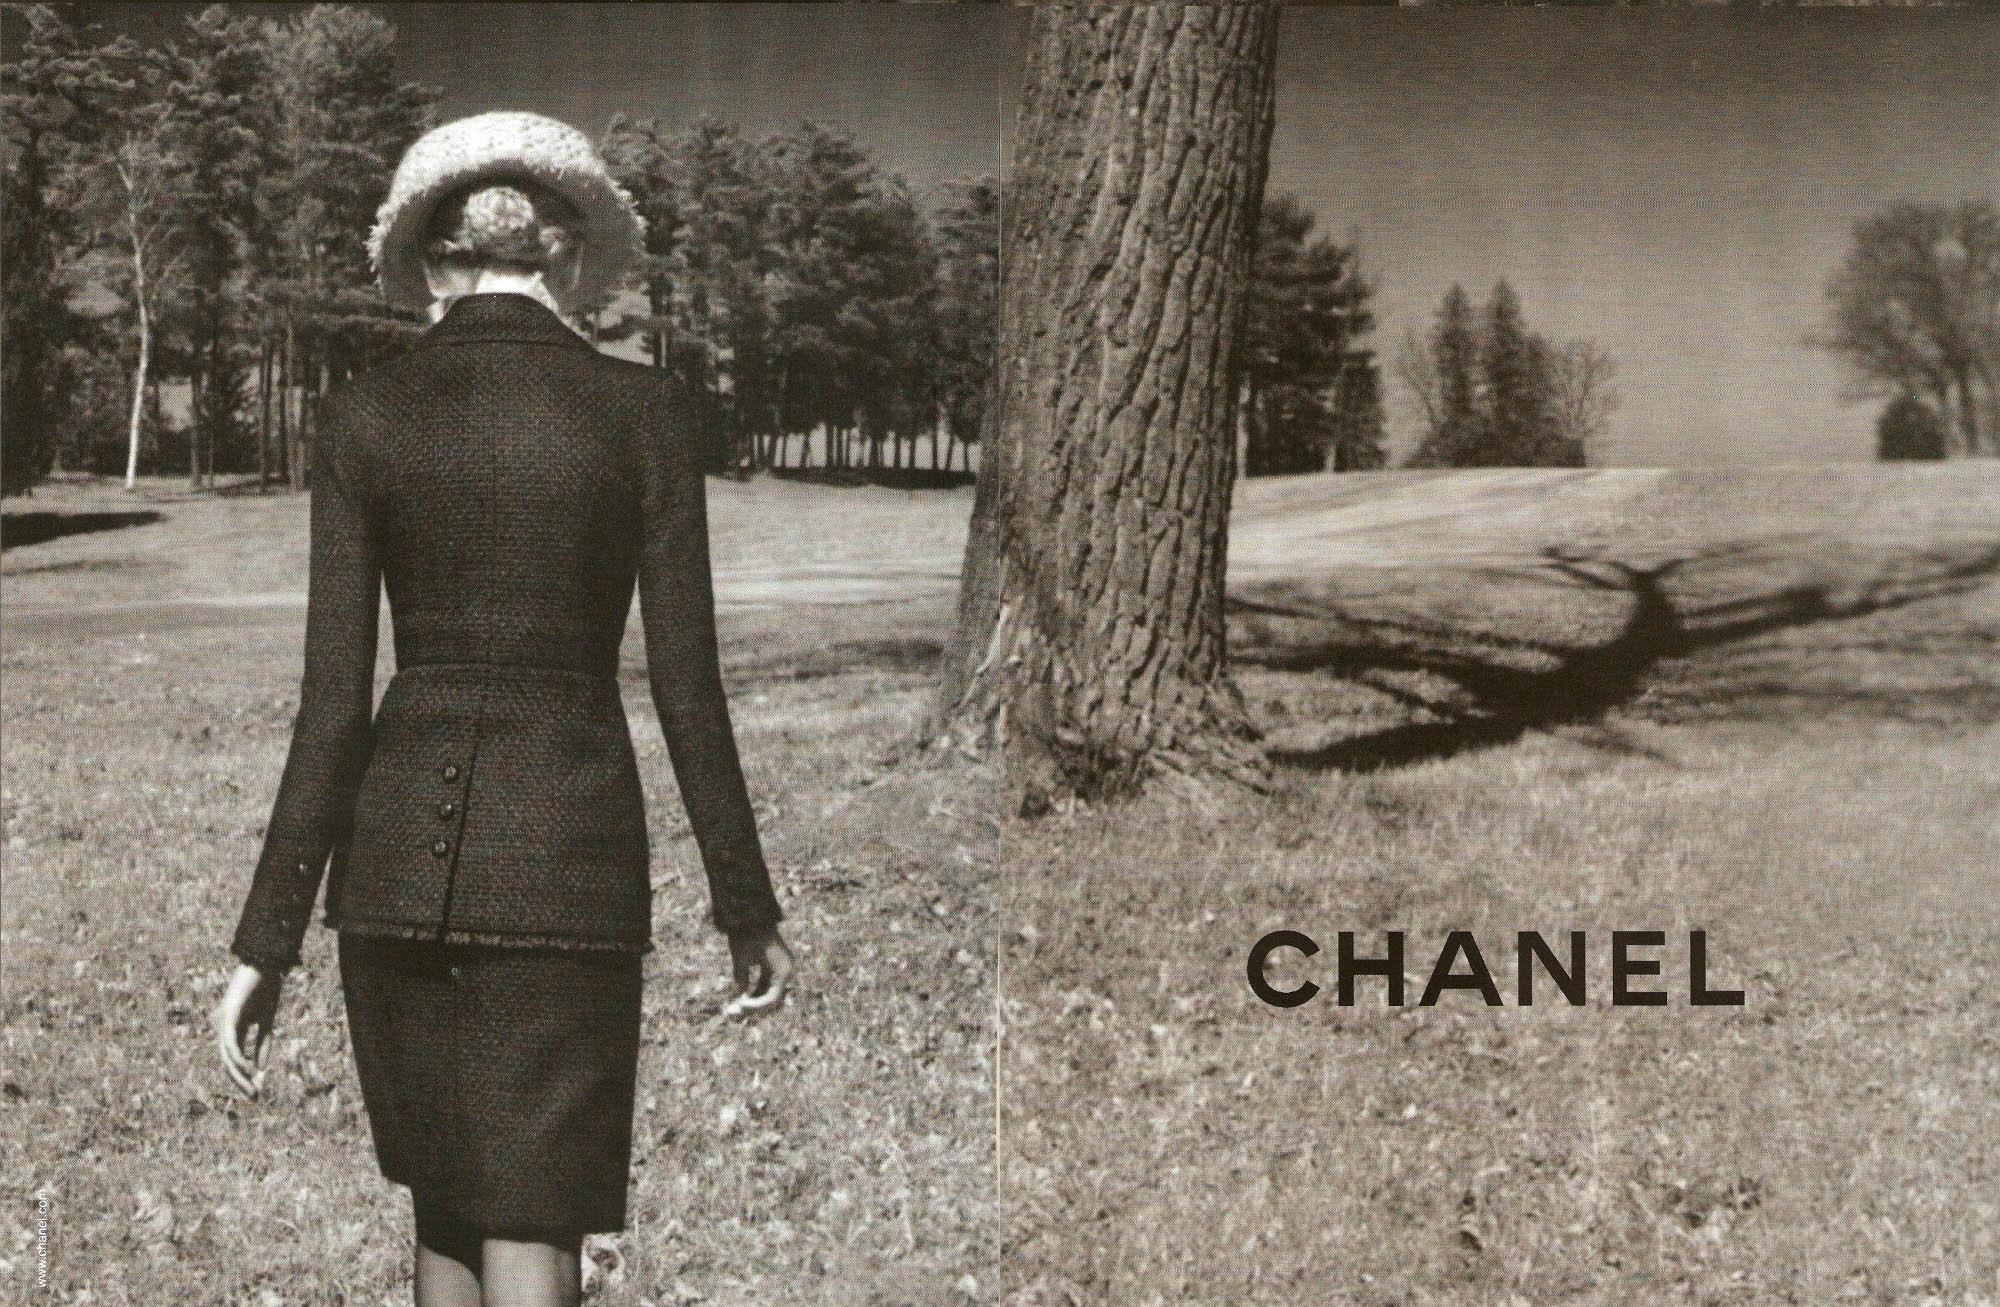 Chanel desktop wallpaper 2000x1307